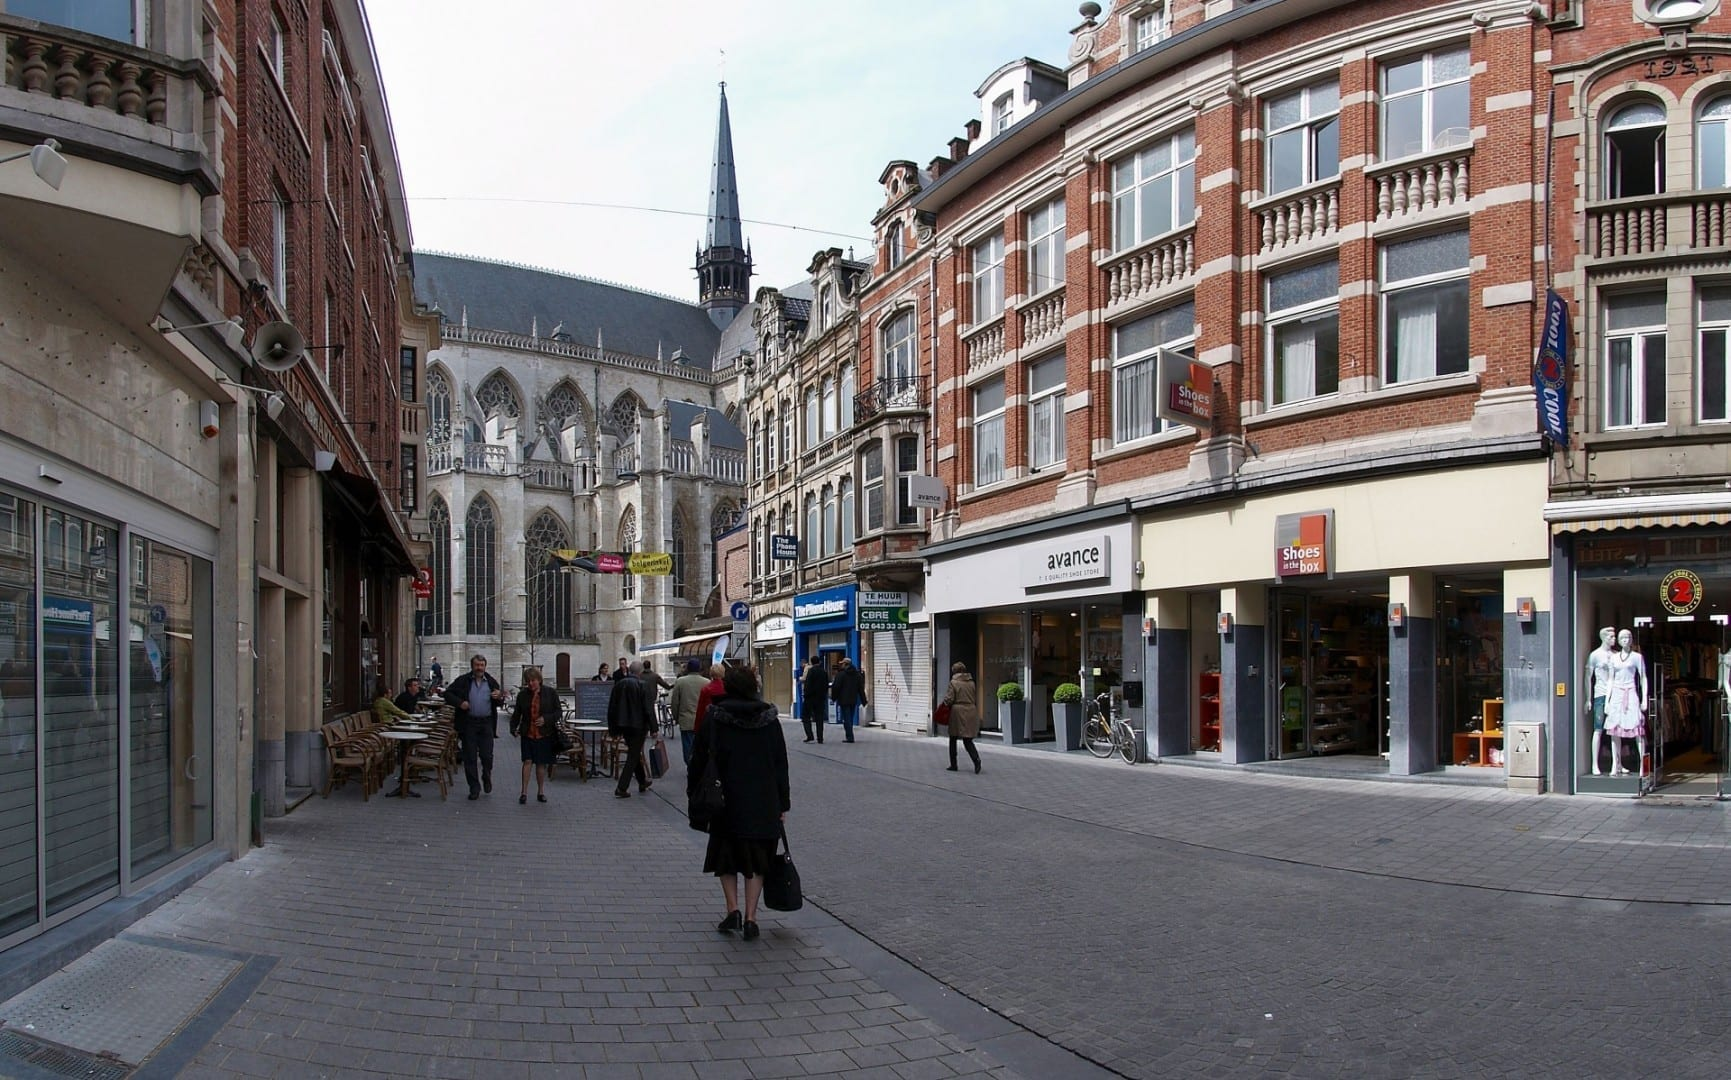 El final de la Diestsestraat, cerca de la Iglesia de San Pedro. Lovaina Bélgica